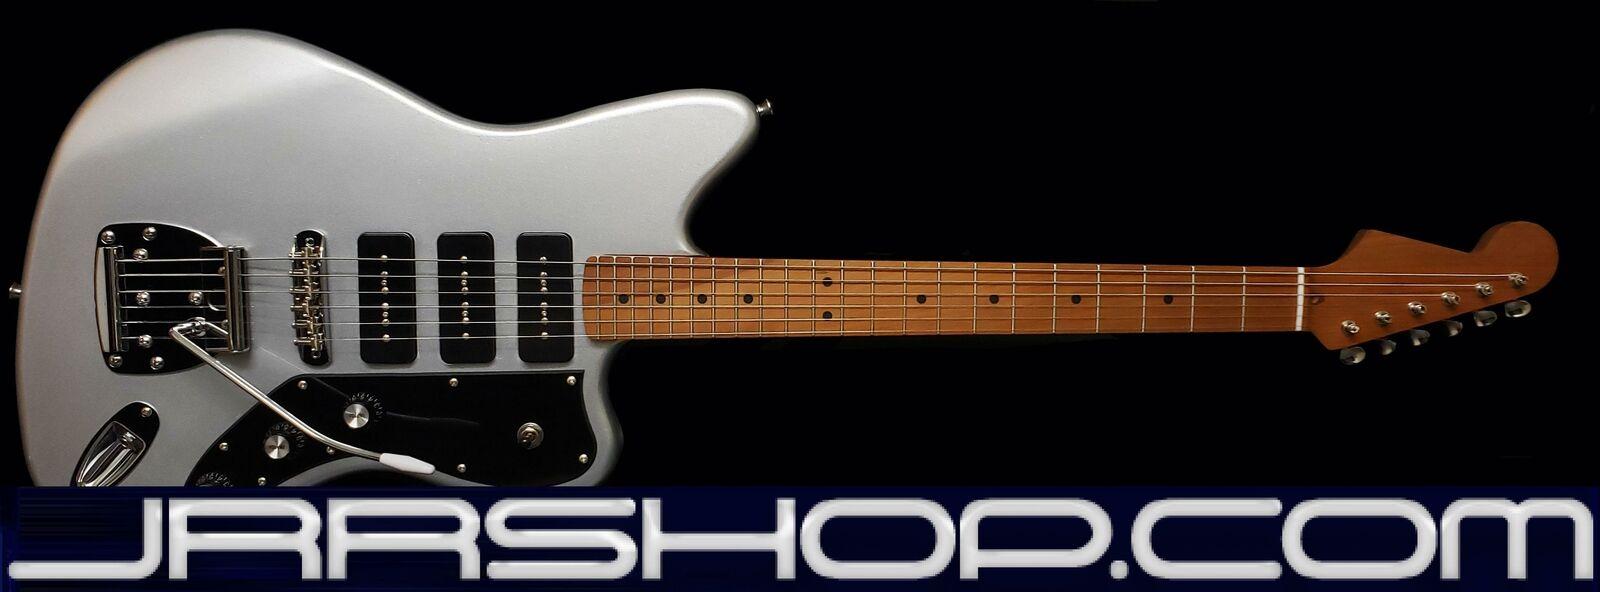 Tone Bakery Jazzbird Warmoth Roasted Neck & Seymour Duncan Pickups - Metallic Si